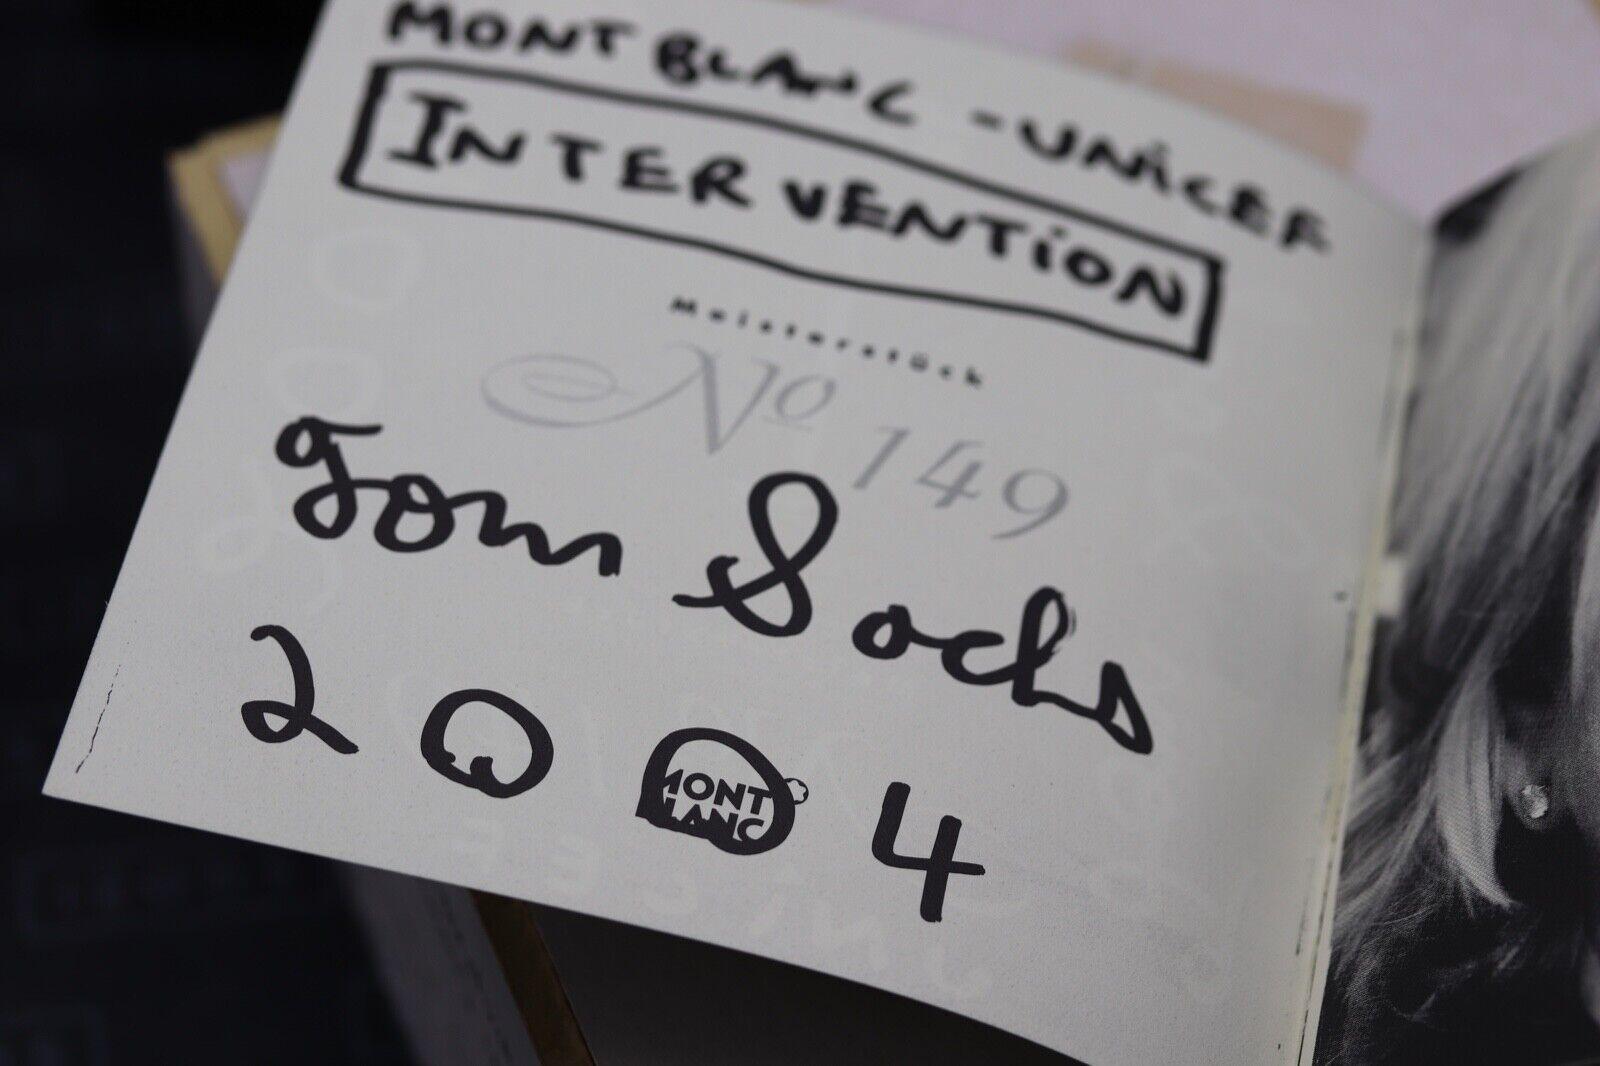 Montblanc Meisterstuck 149 Tom Sachs UNICEF Fountain Pen Set - UNUSED 5